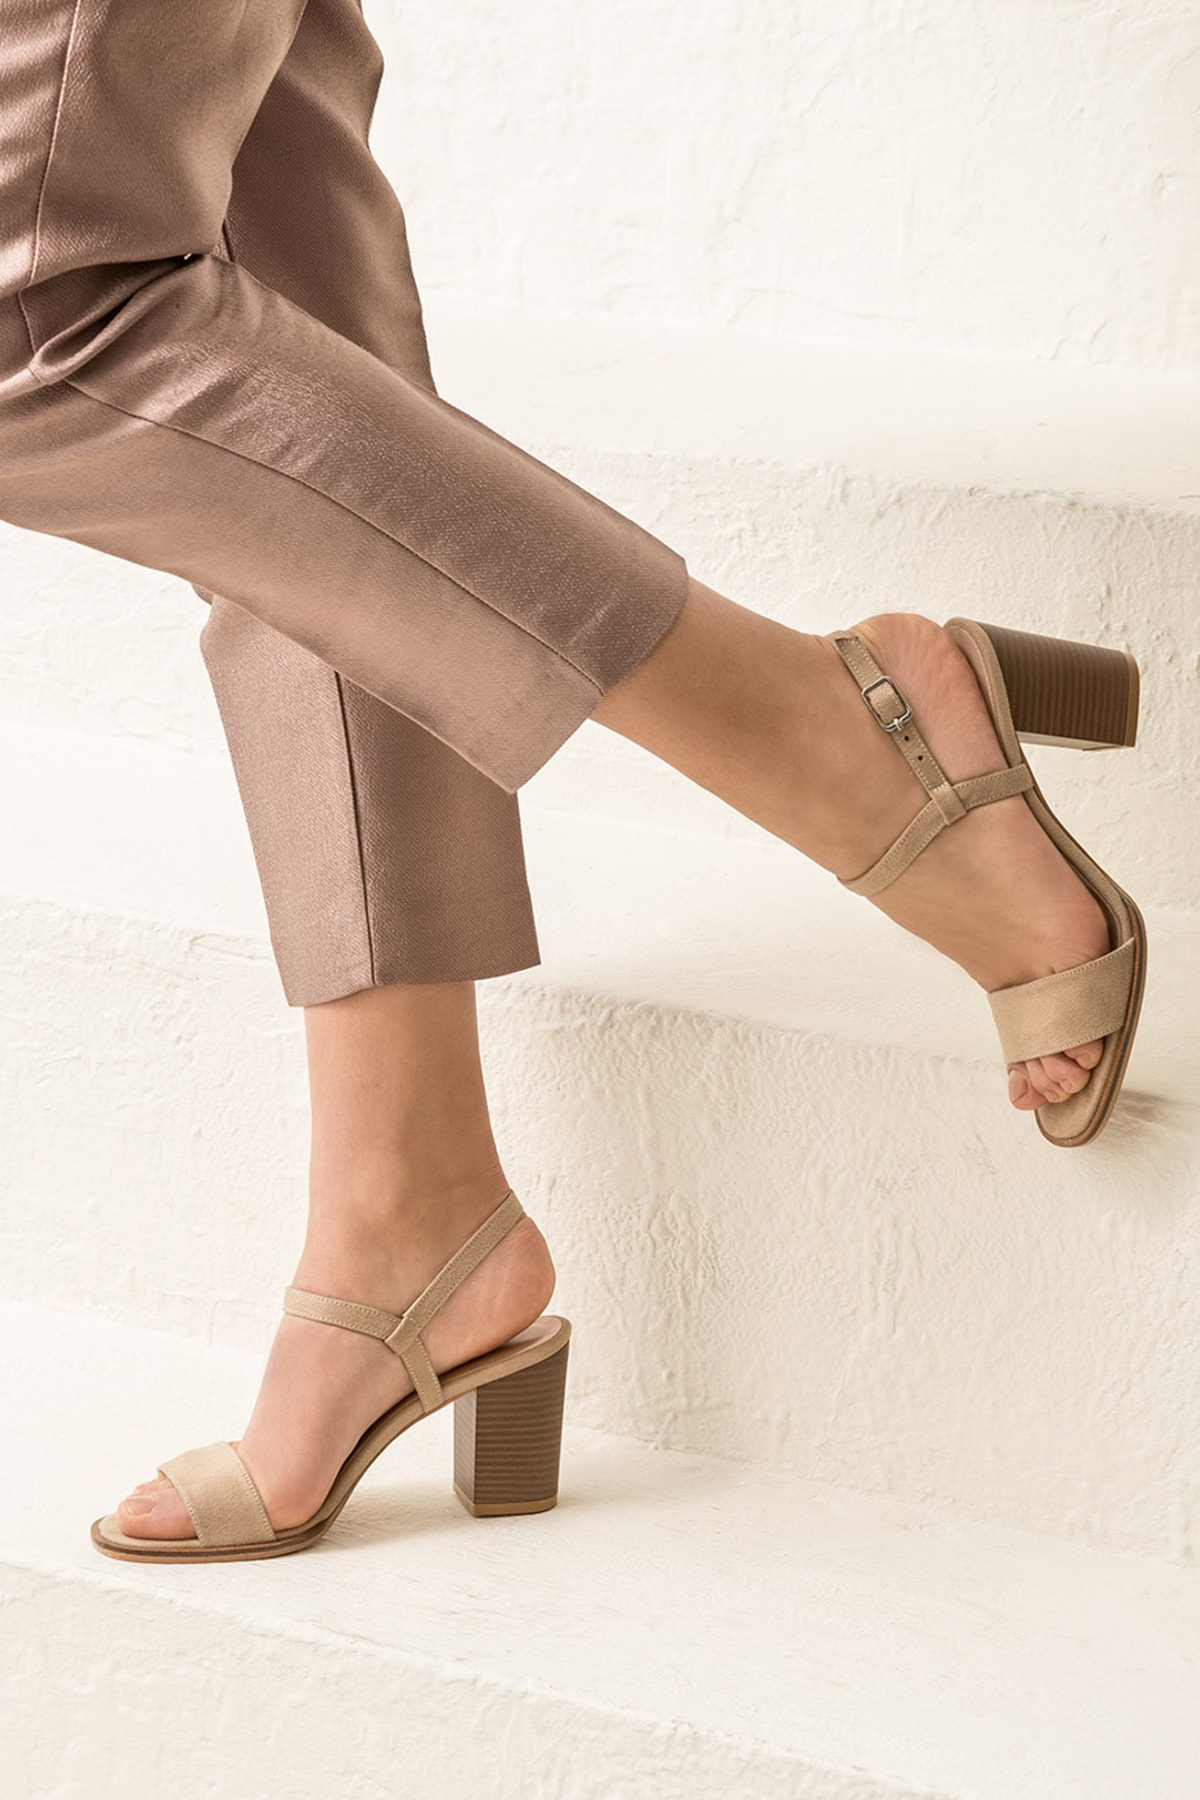 Elle Shoes GUSTINEE Bej Kadın Sandalet 1